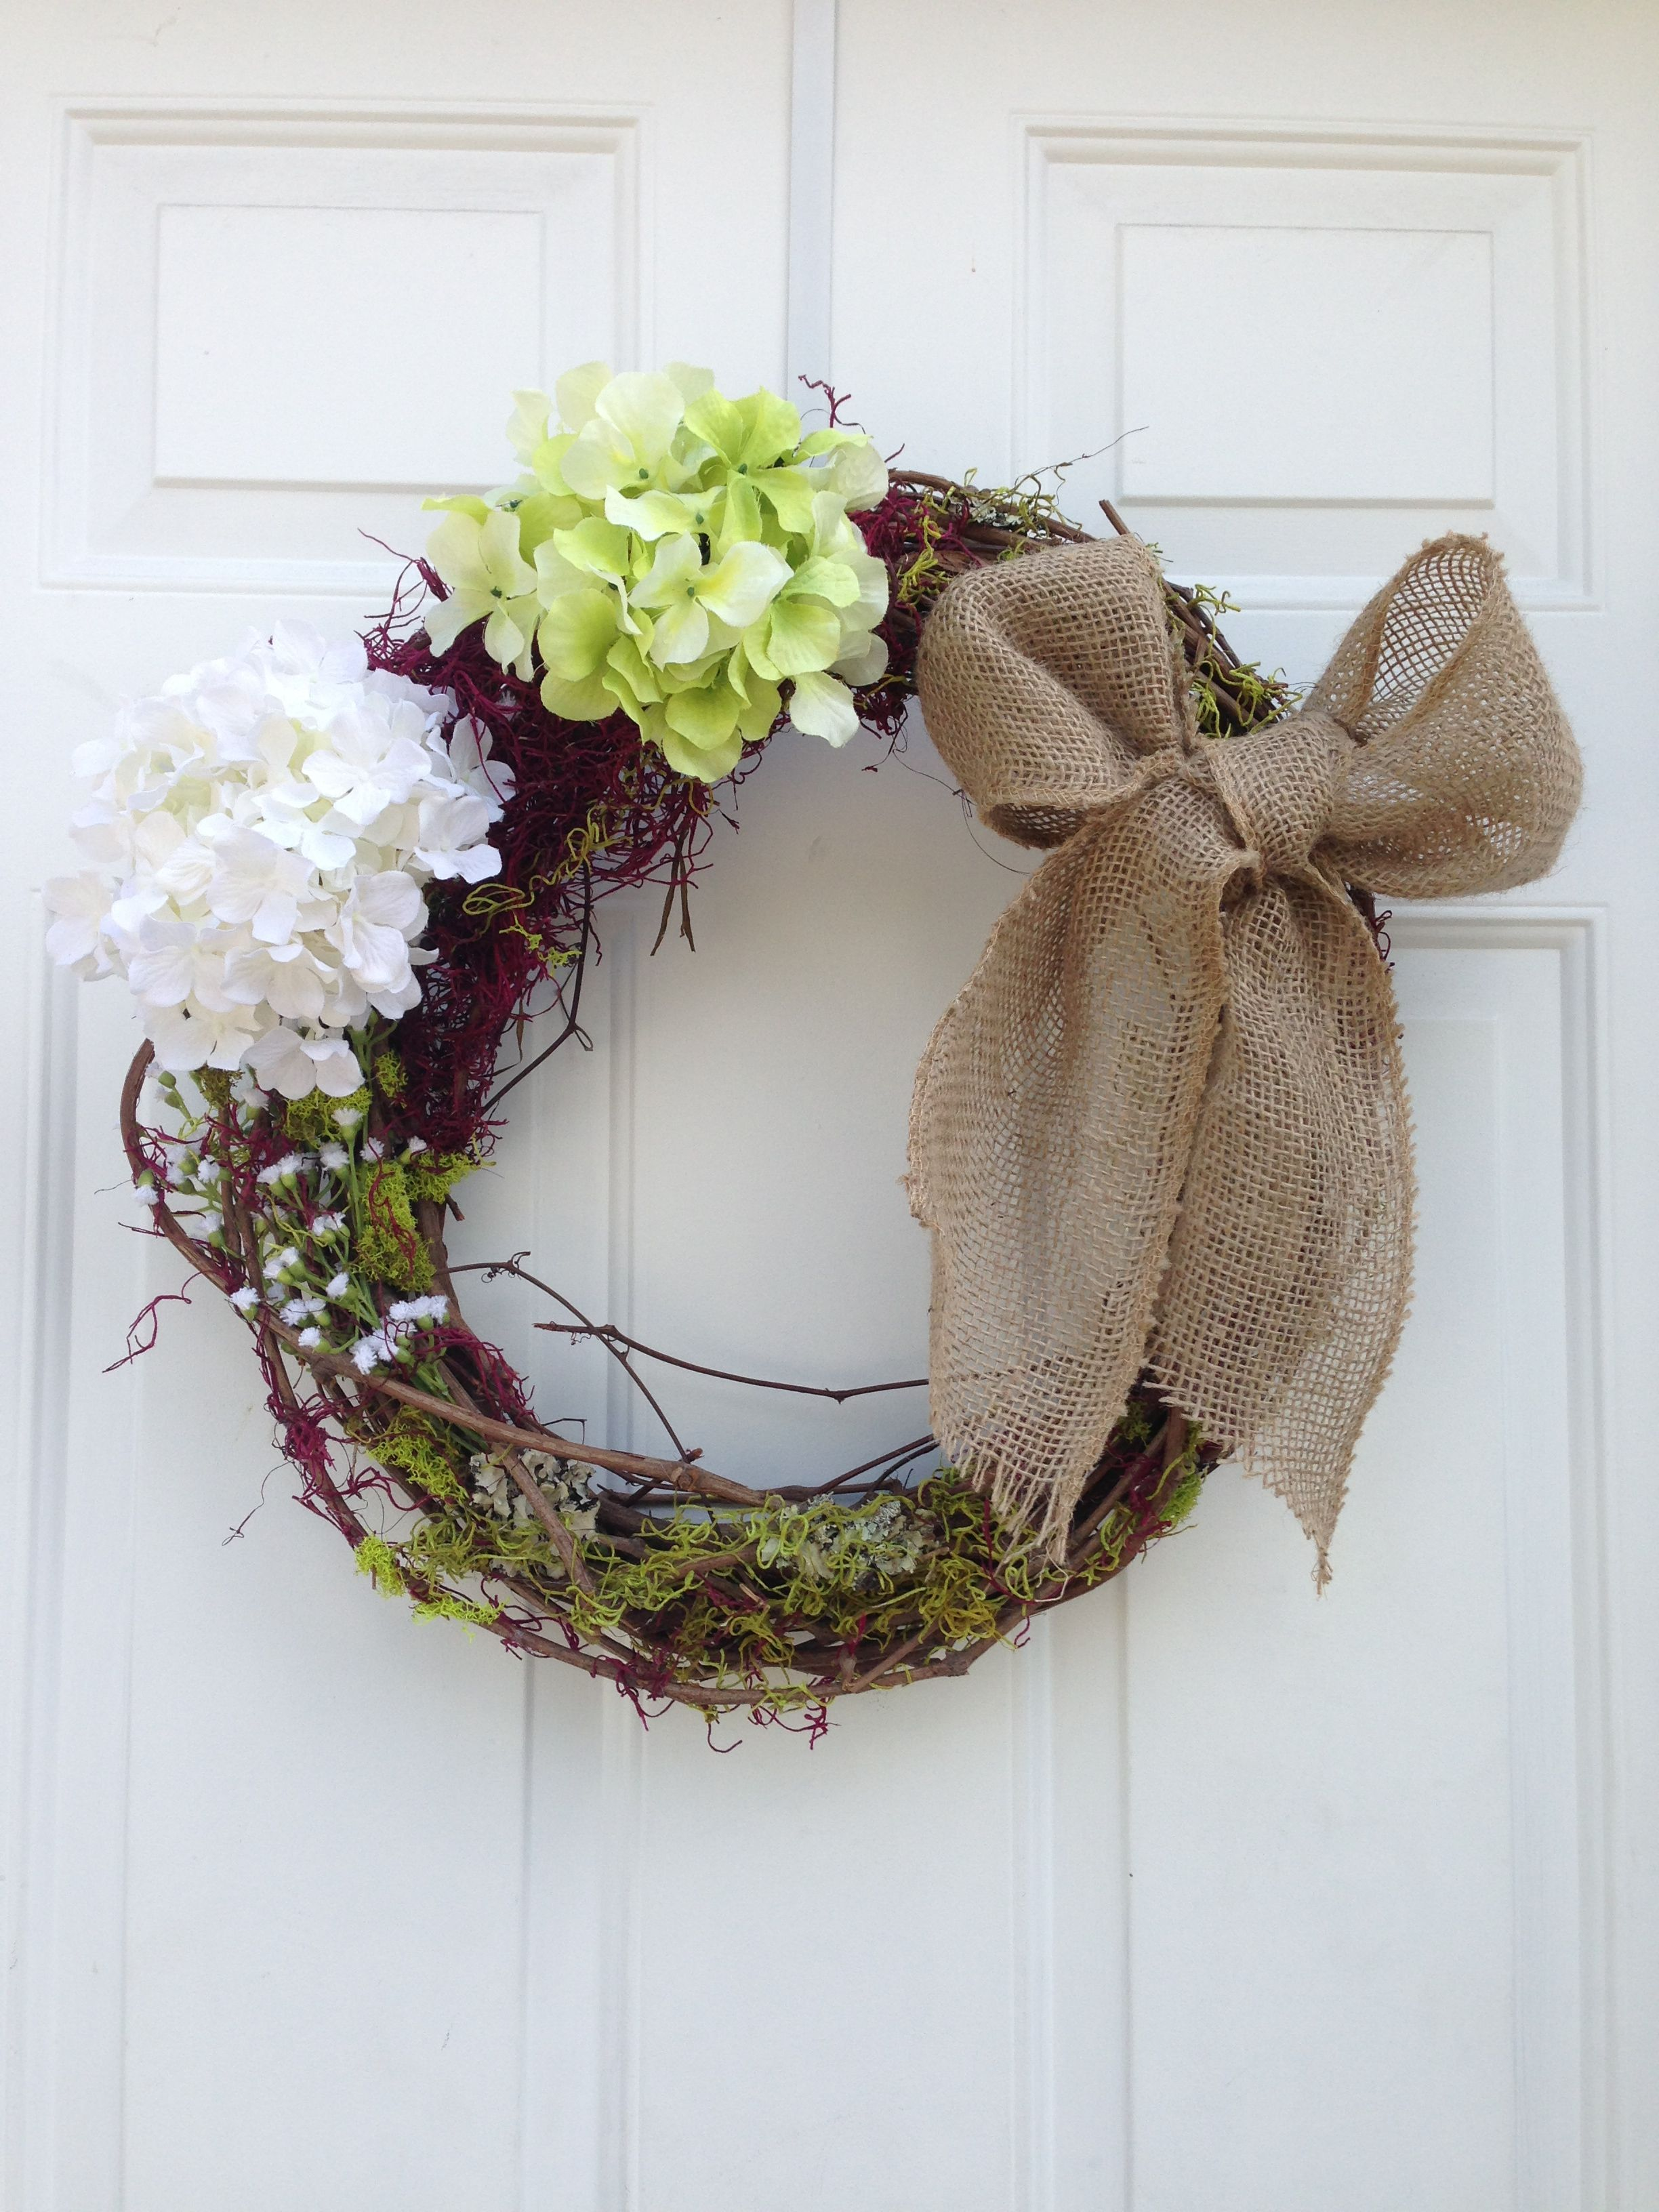 Made my first wreath! #crafty